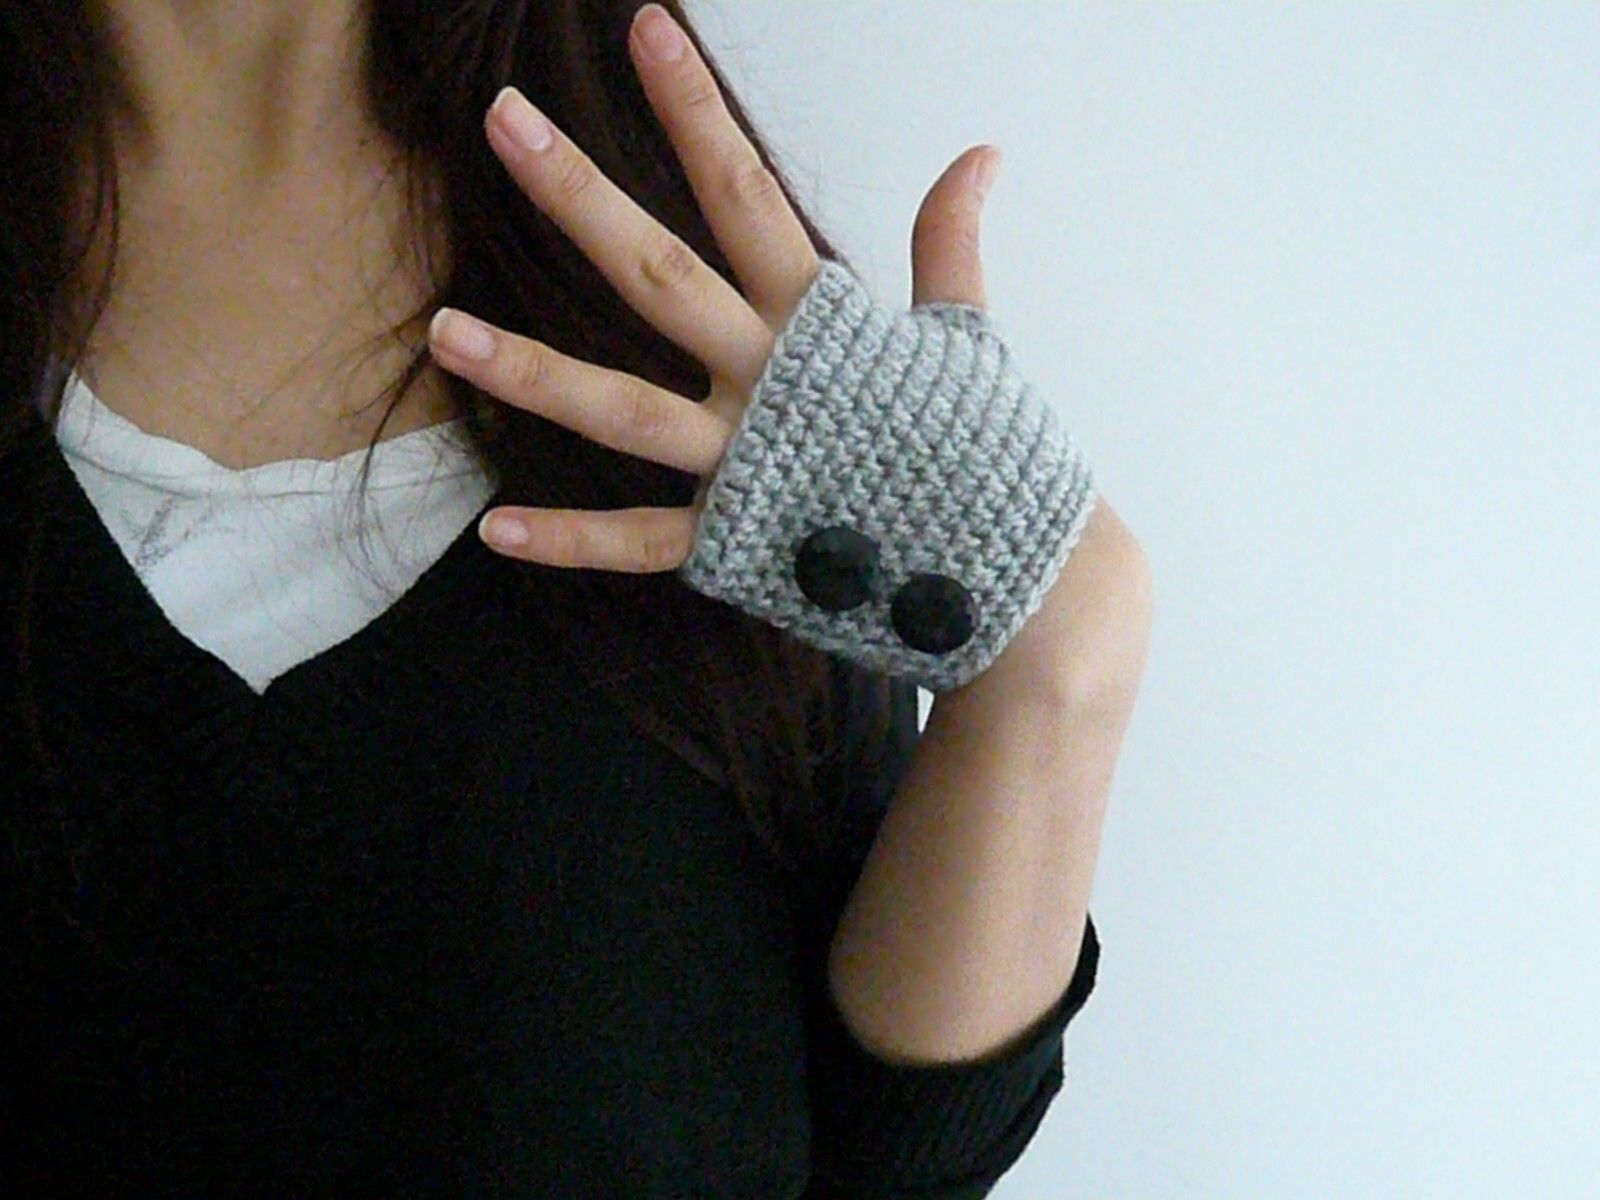 Easy crochet mittens free easy crochet patterns baby mittens easy crochet mittens free easy crochet patterns baby mittens bankloansurffo Images